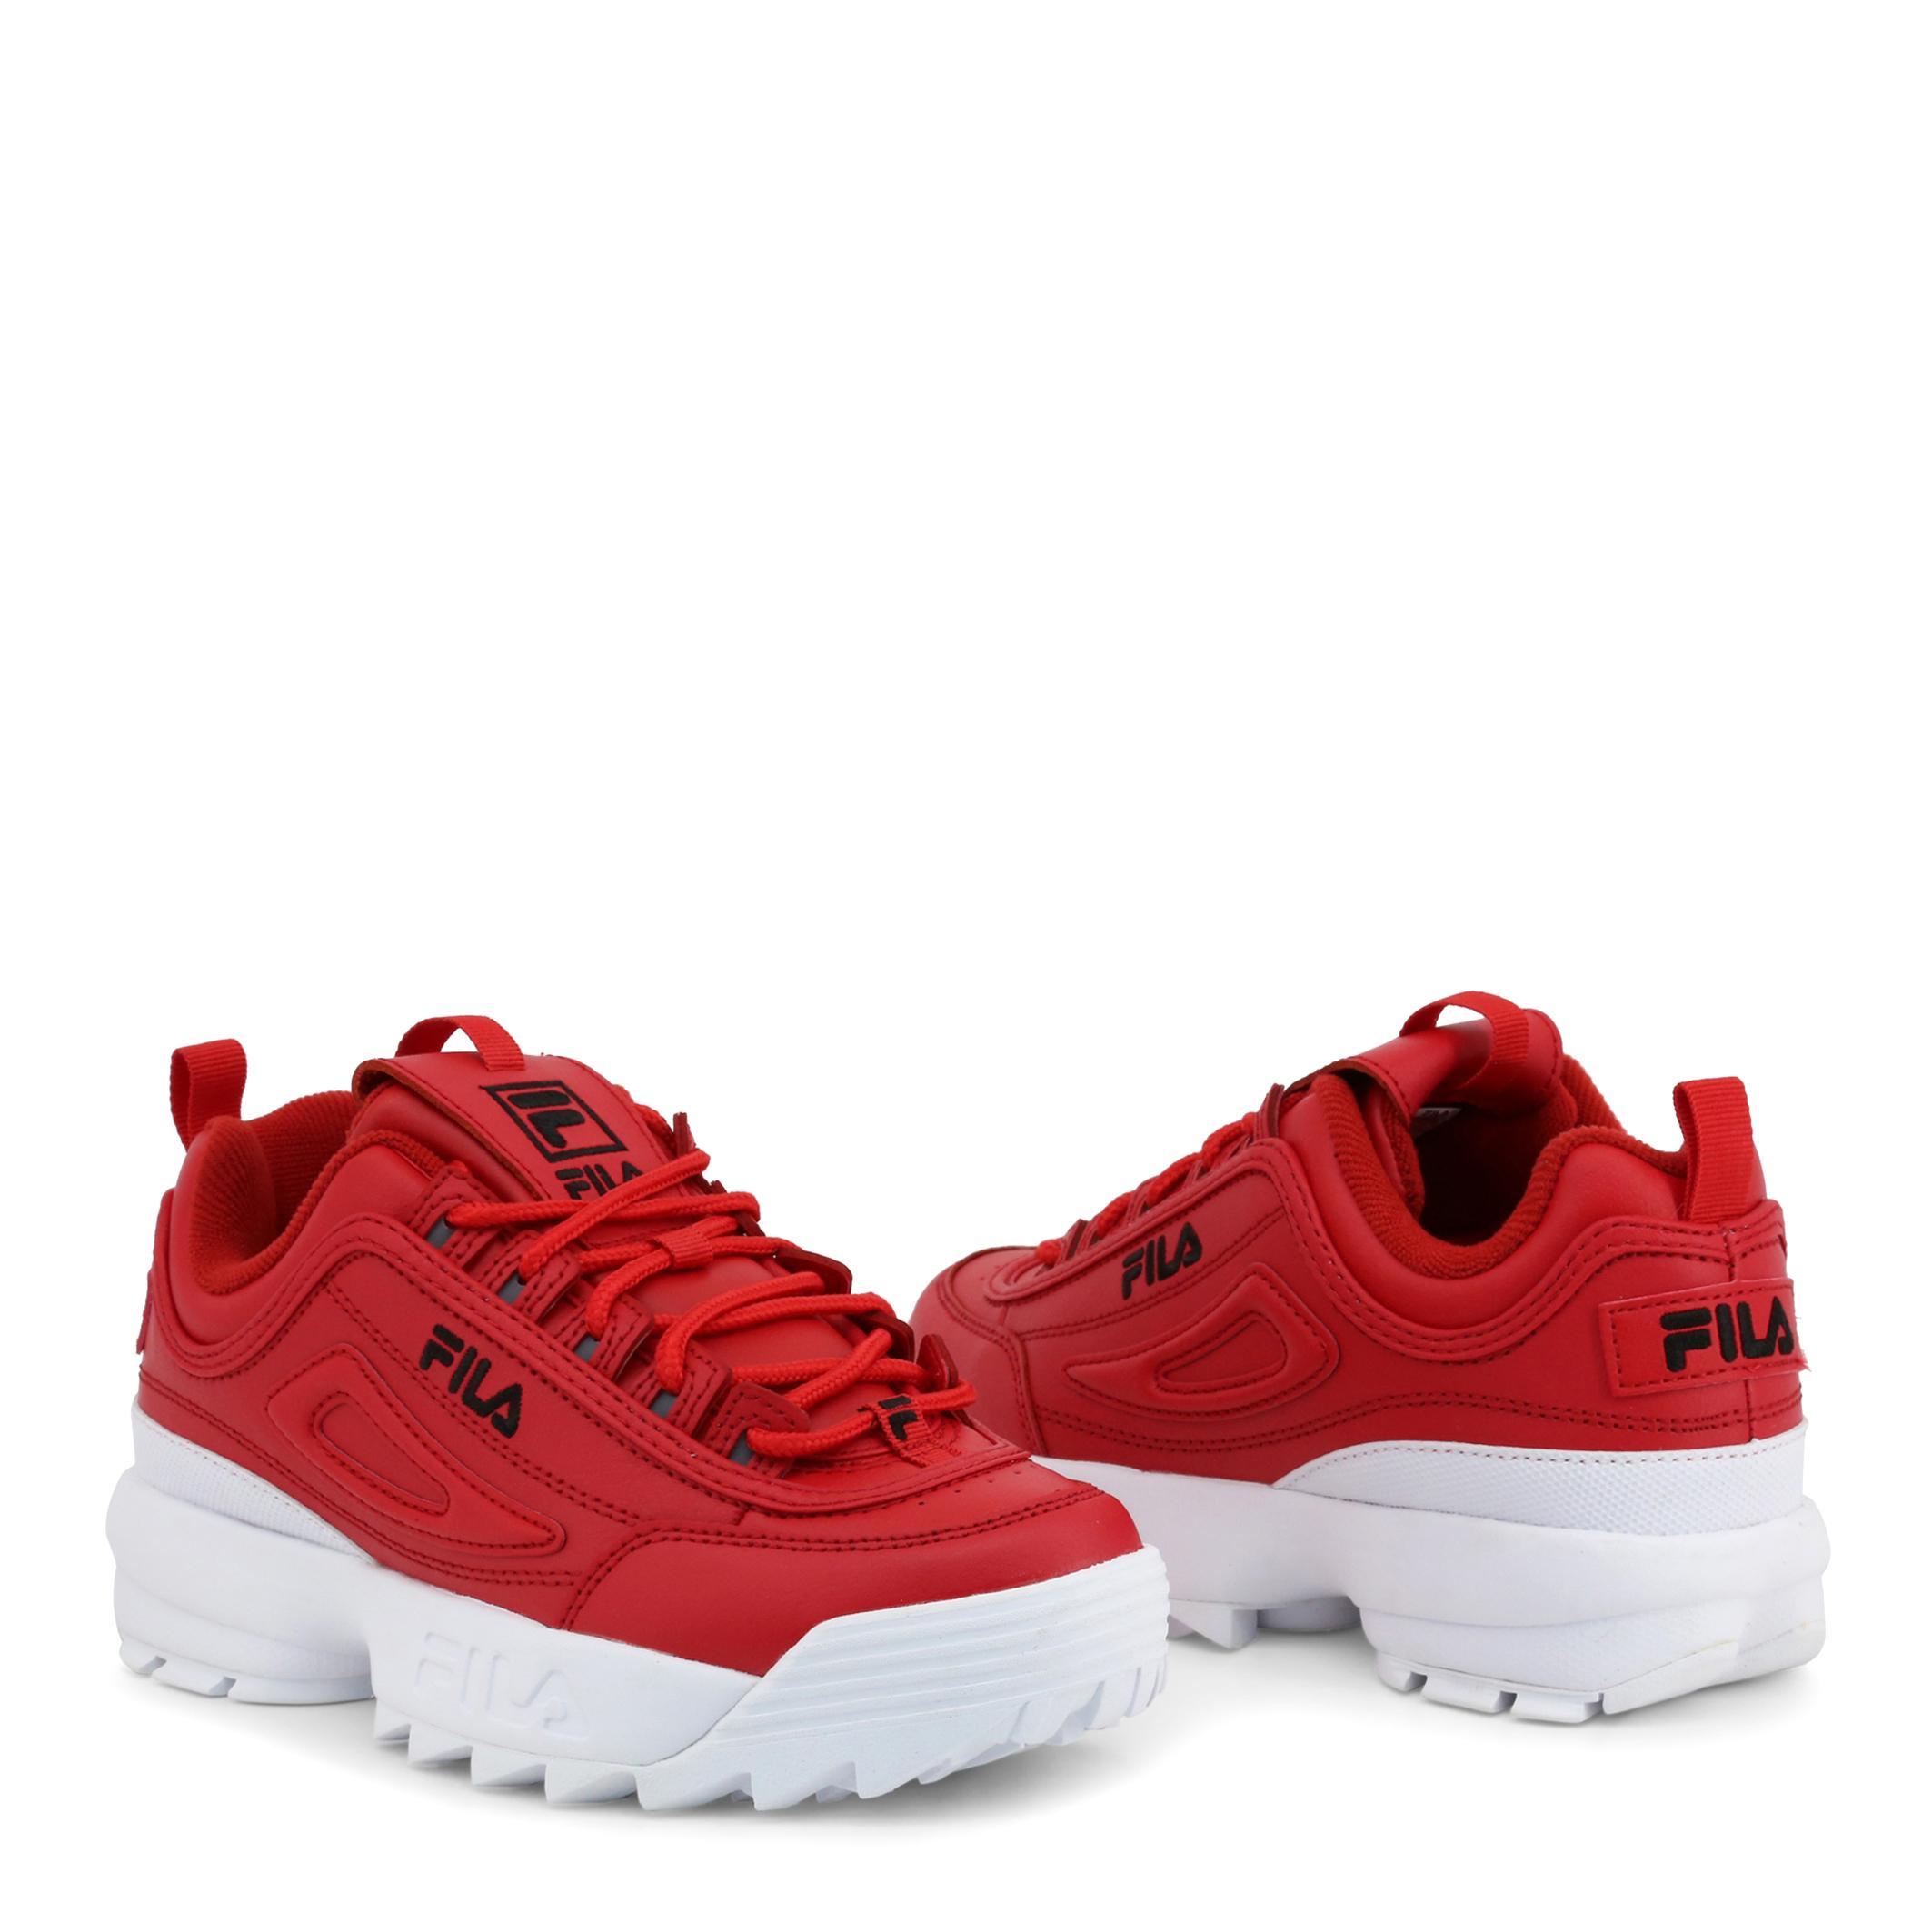 Fila Baskets femme DISRUPTOR 2 PREMIUM Red